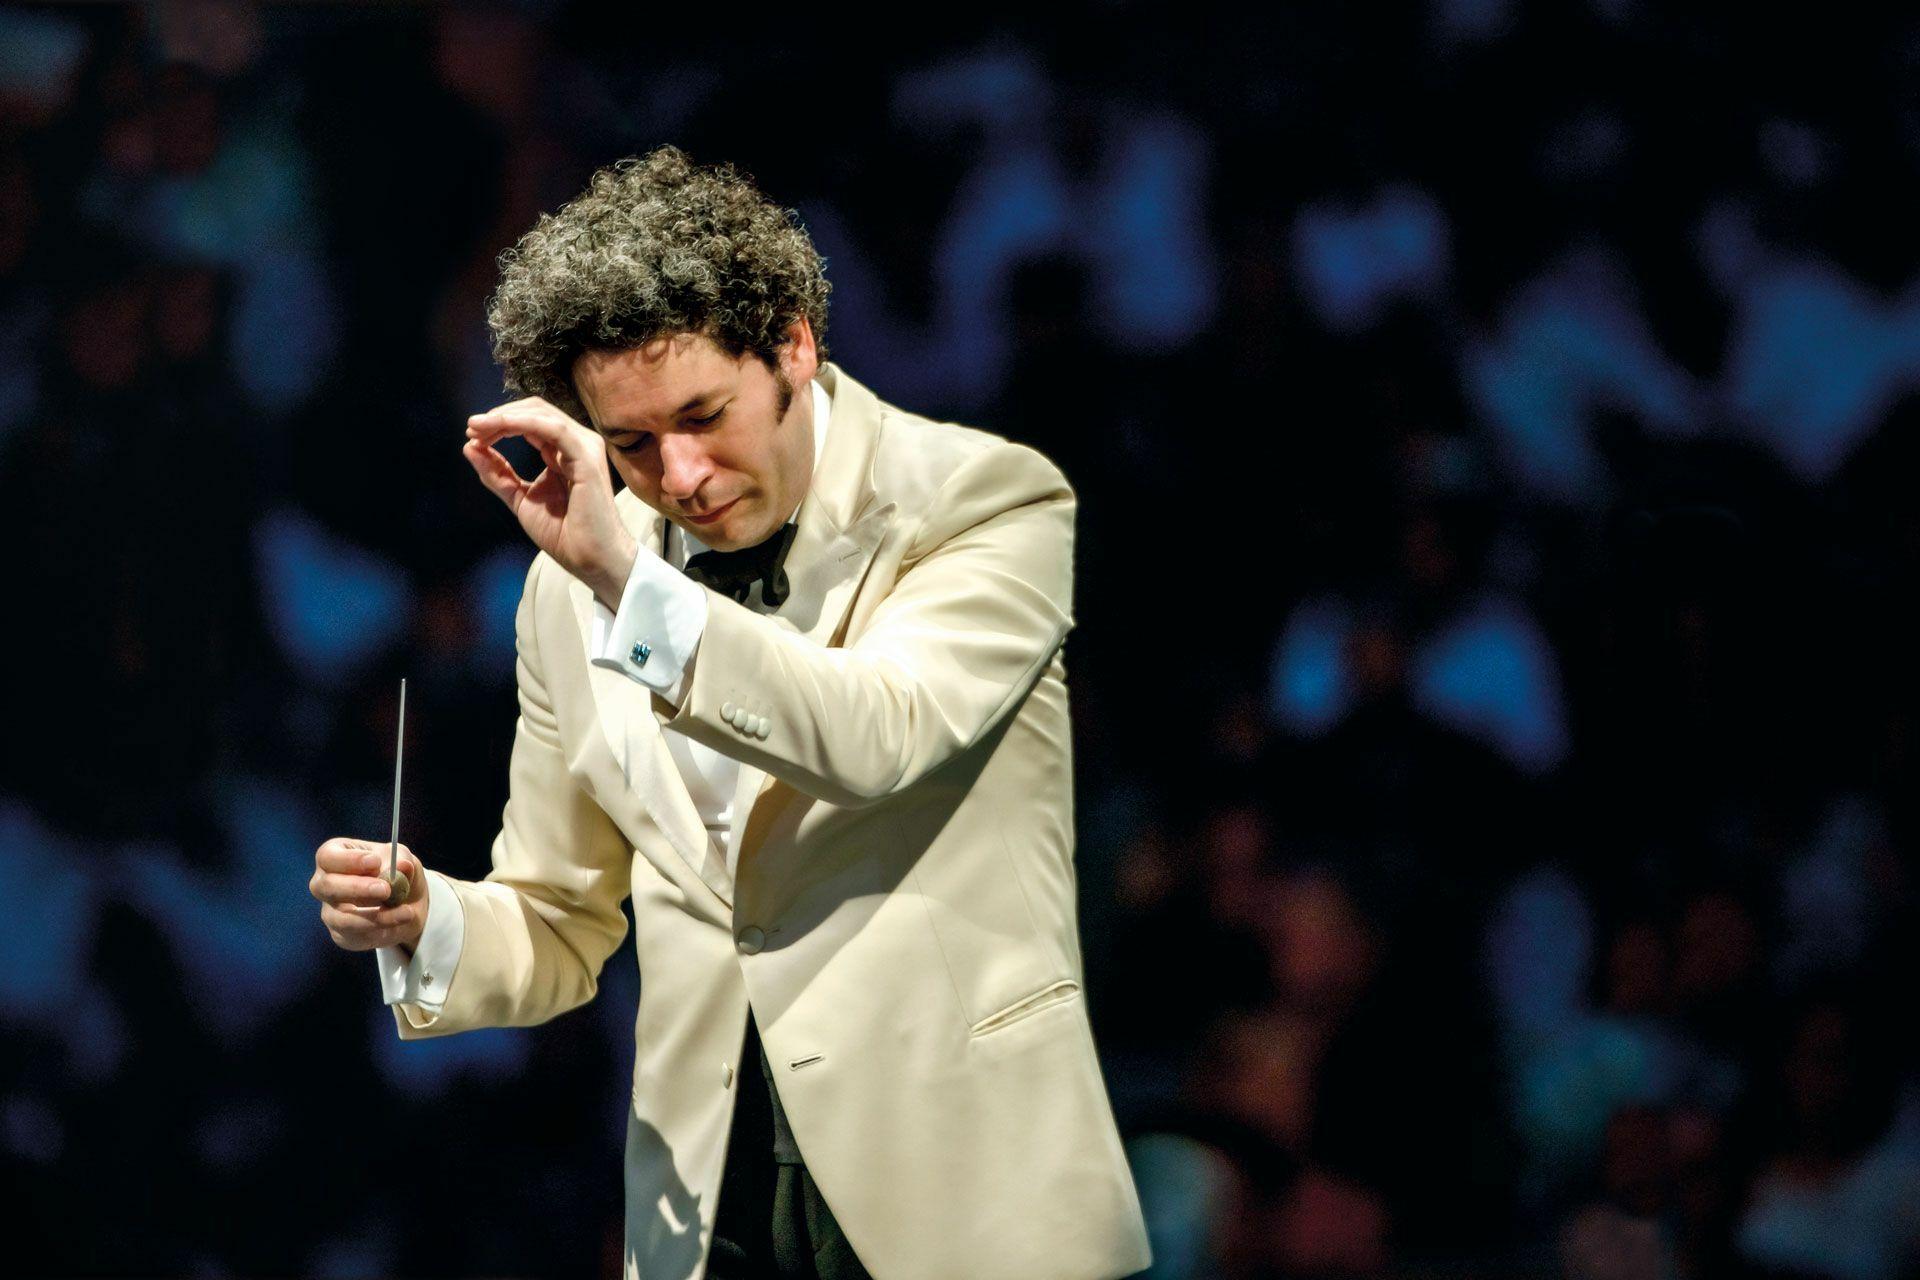 Mozart Under the Stars with Dudamel